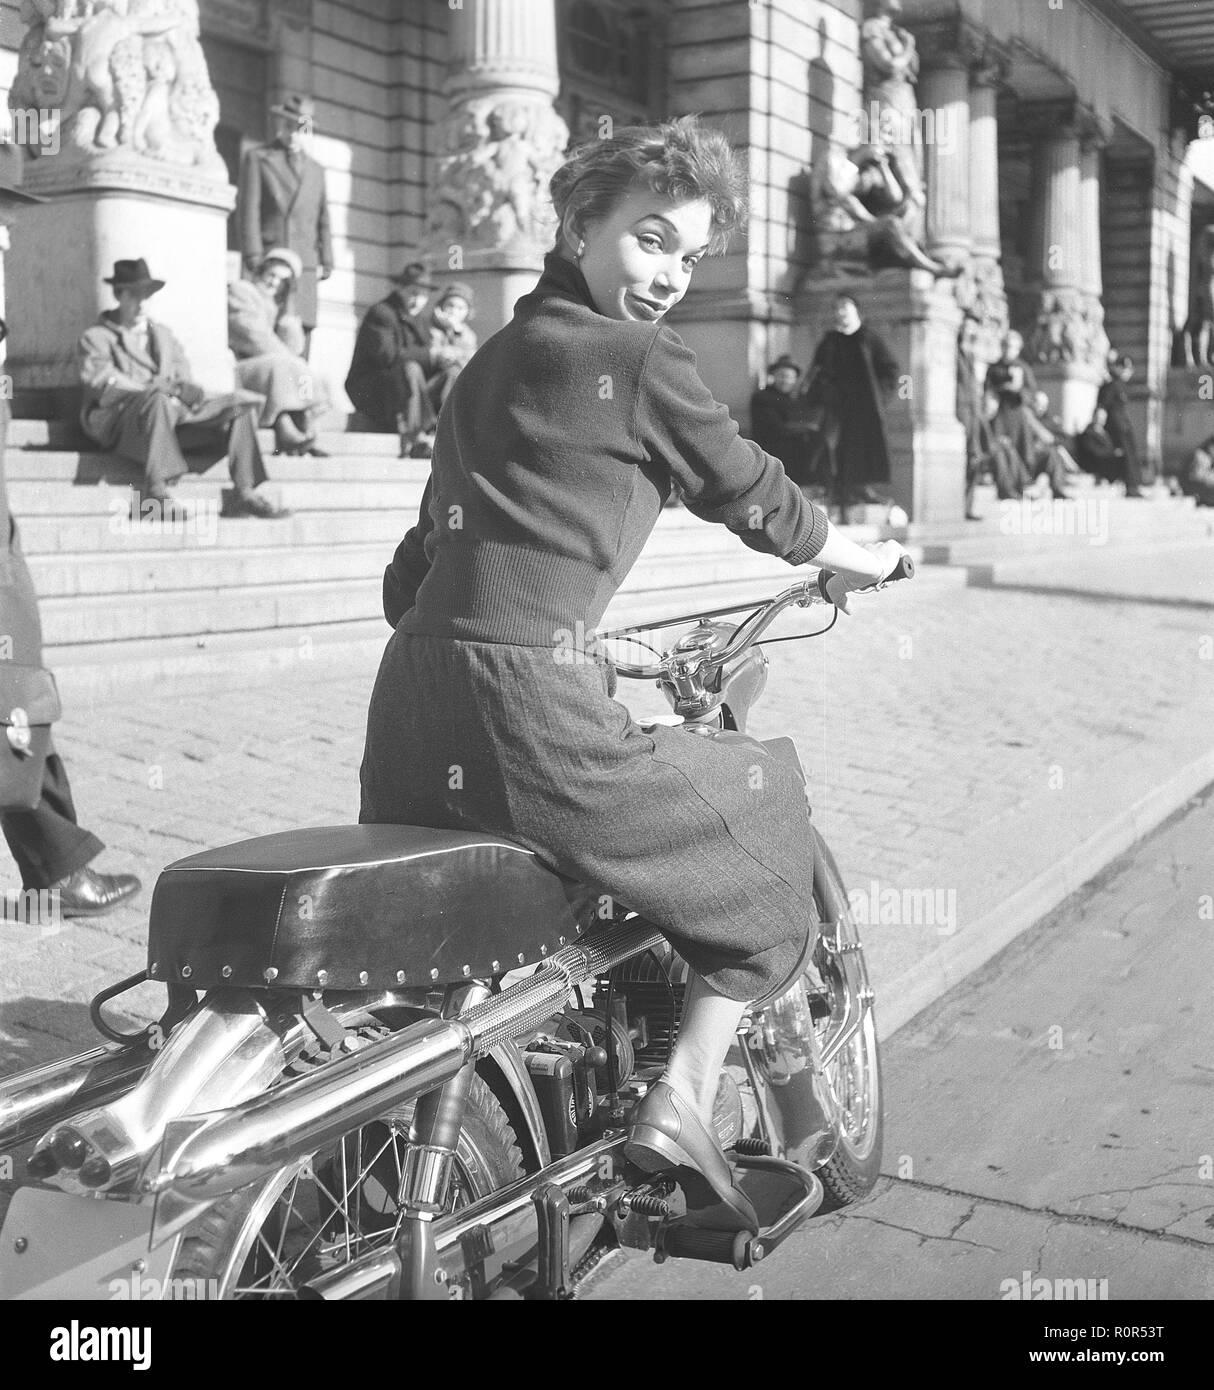 Margit Carlqvist , swedish actress, born 1932, pictured here on a Husqvarna motorcycle model 281 sport, 1954. Photo Kristoffersson Ref BO63-1 - Stock Image